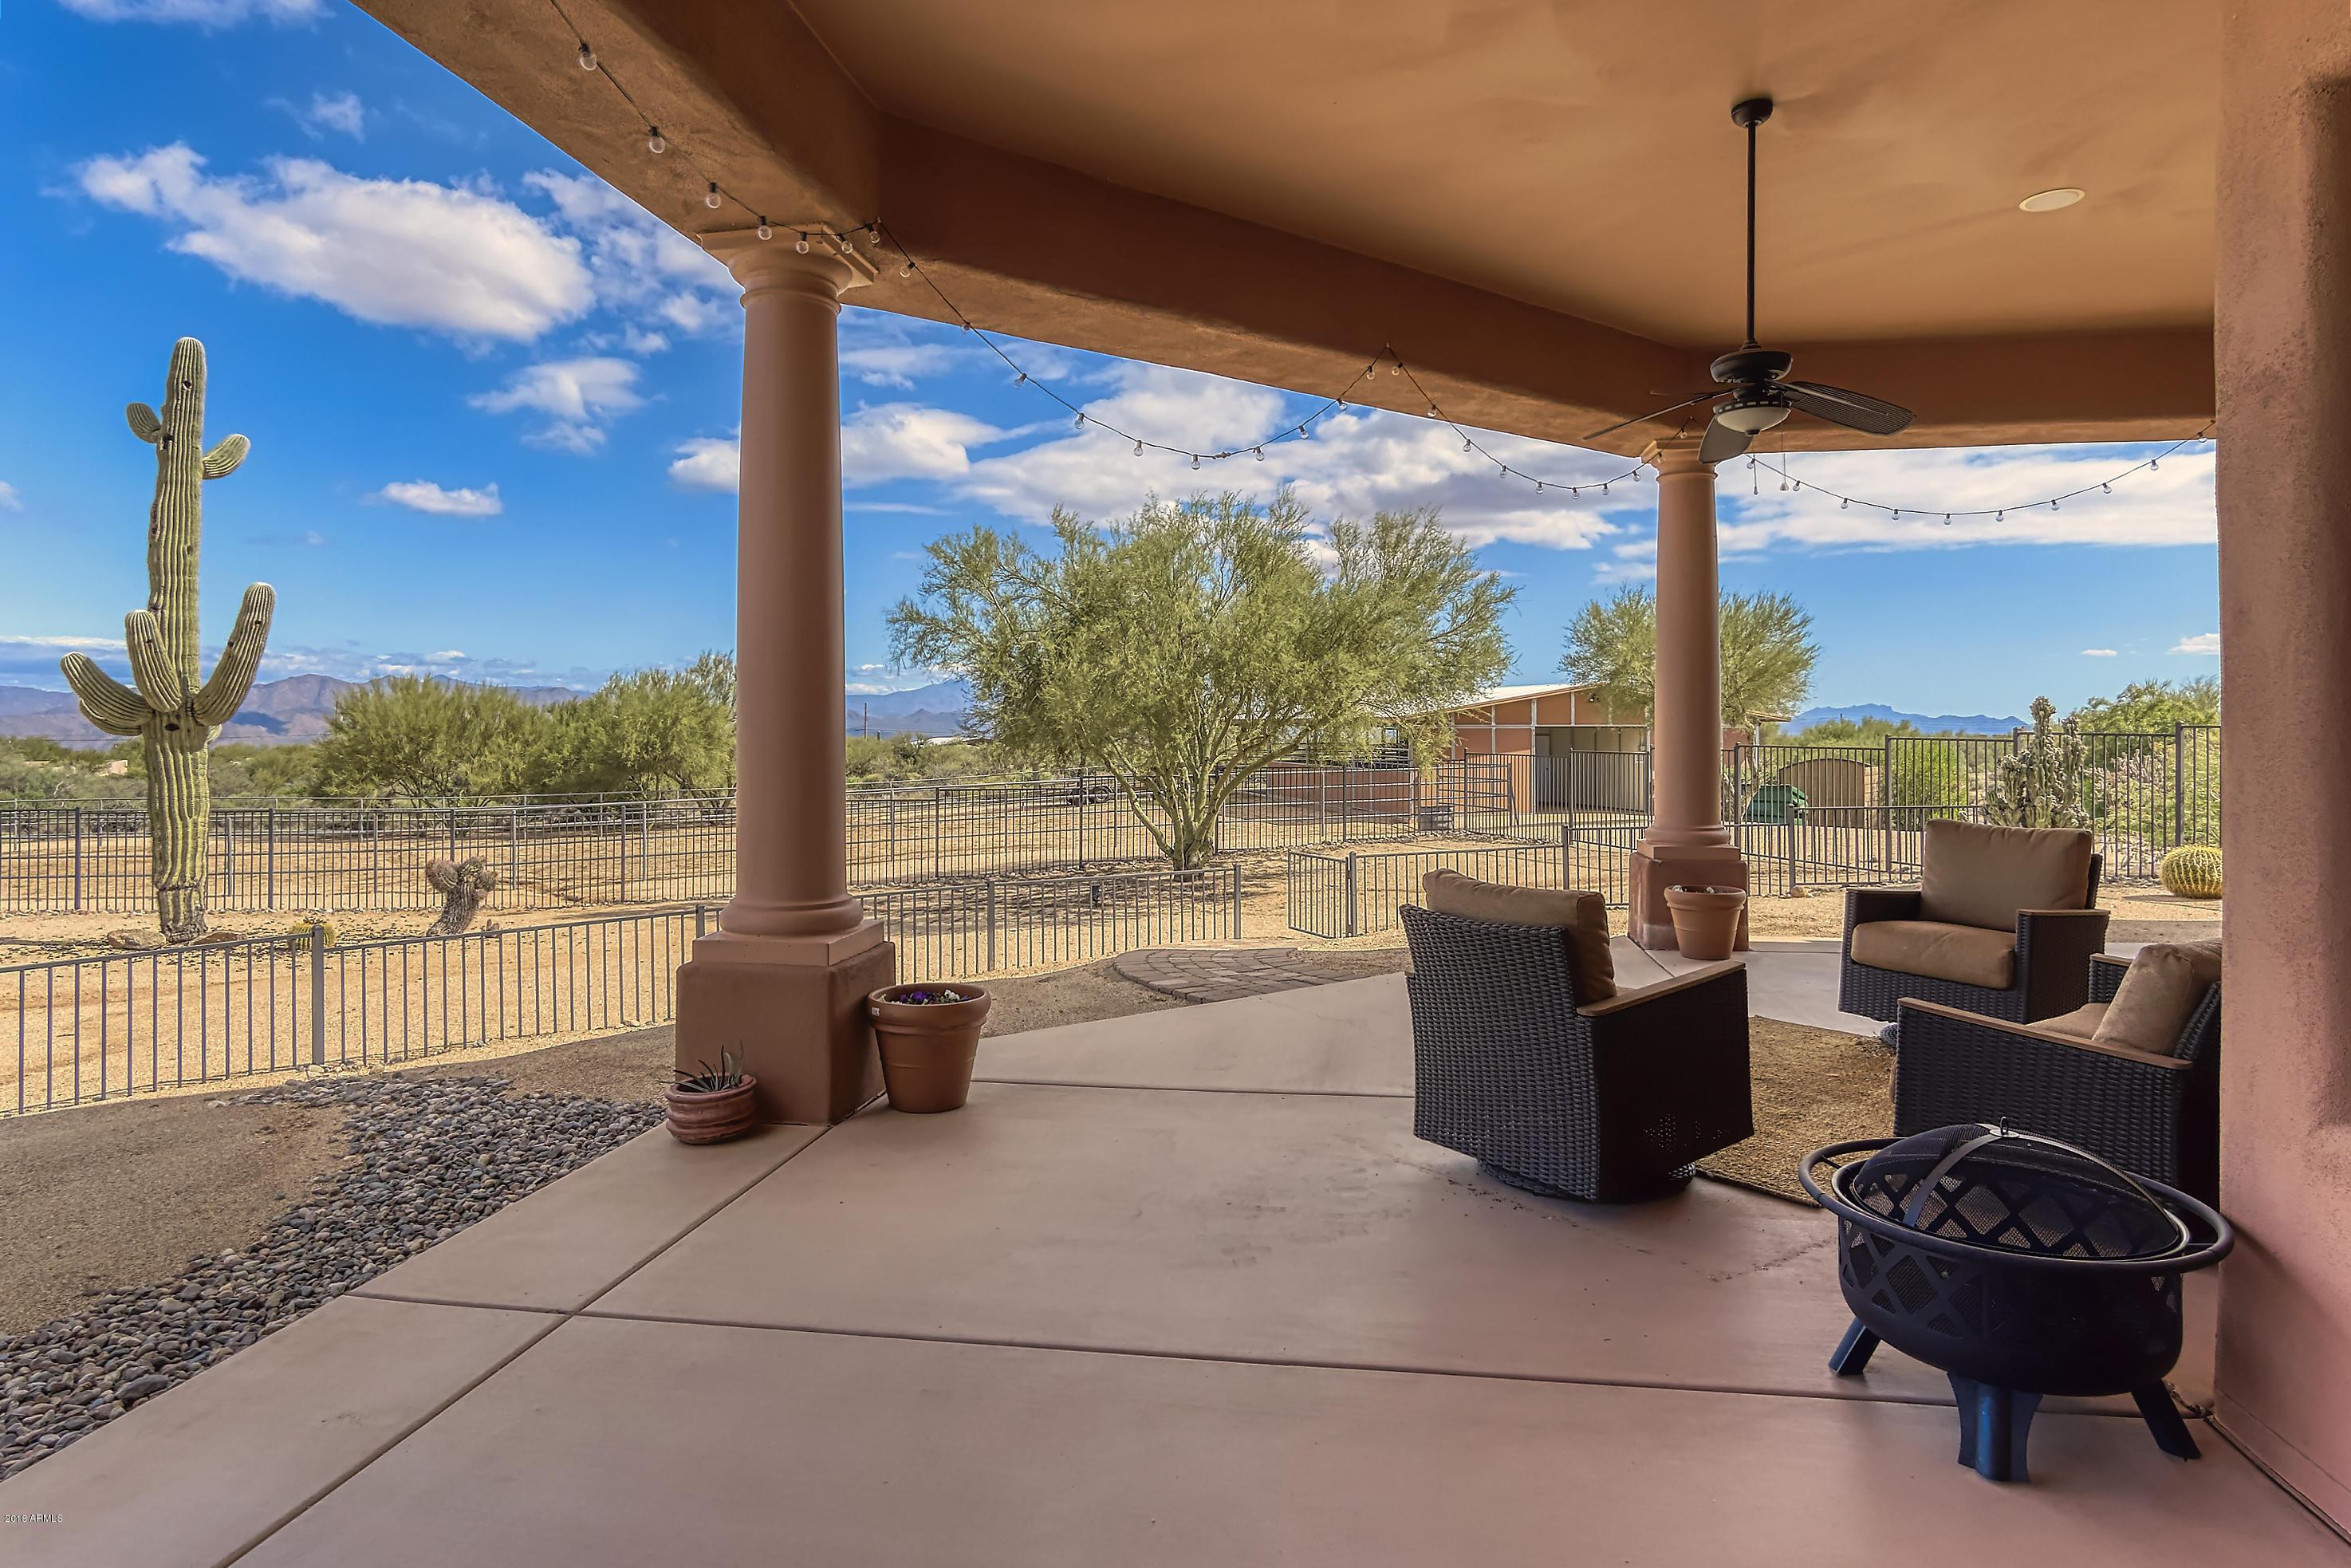 MLS 5835870 29921 N Baker Court, Scottsdale, AZ 85262 Scottsdale AZ Granite Mountain Ranch